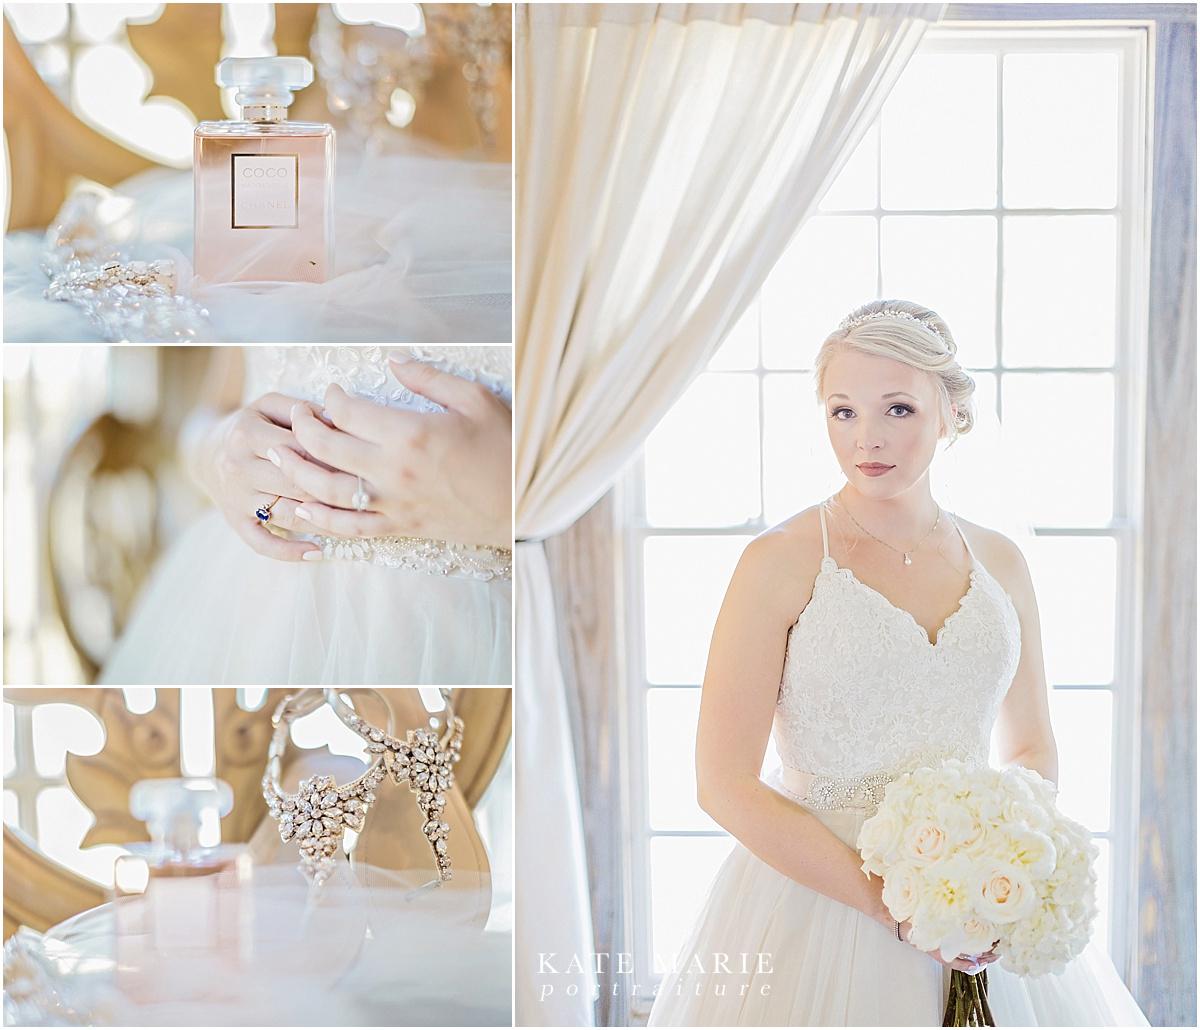 Dallas_Wedding_Photographer_Flower_Mound_Portrait_Photographer_Kate_Marie_Portraiture_Ashley&Ryan_RusticGraceEstate_2.jpg